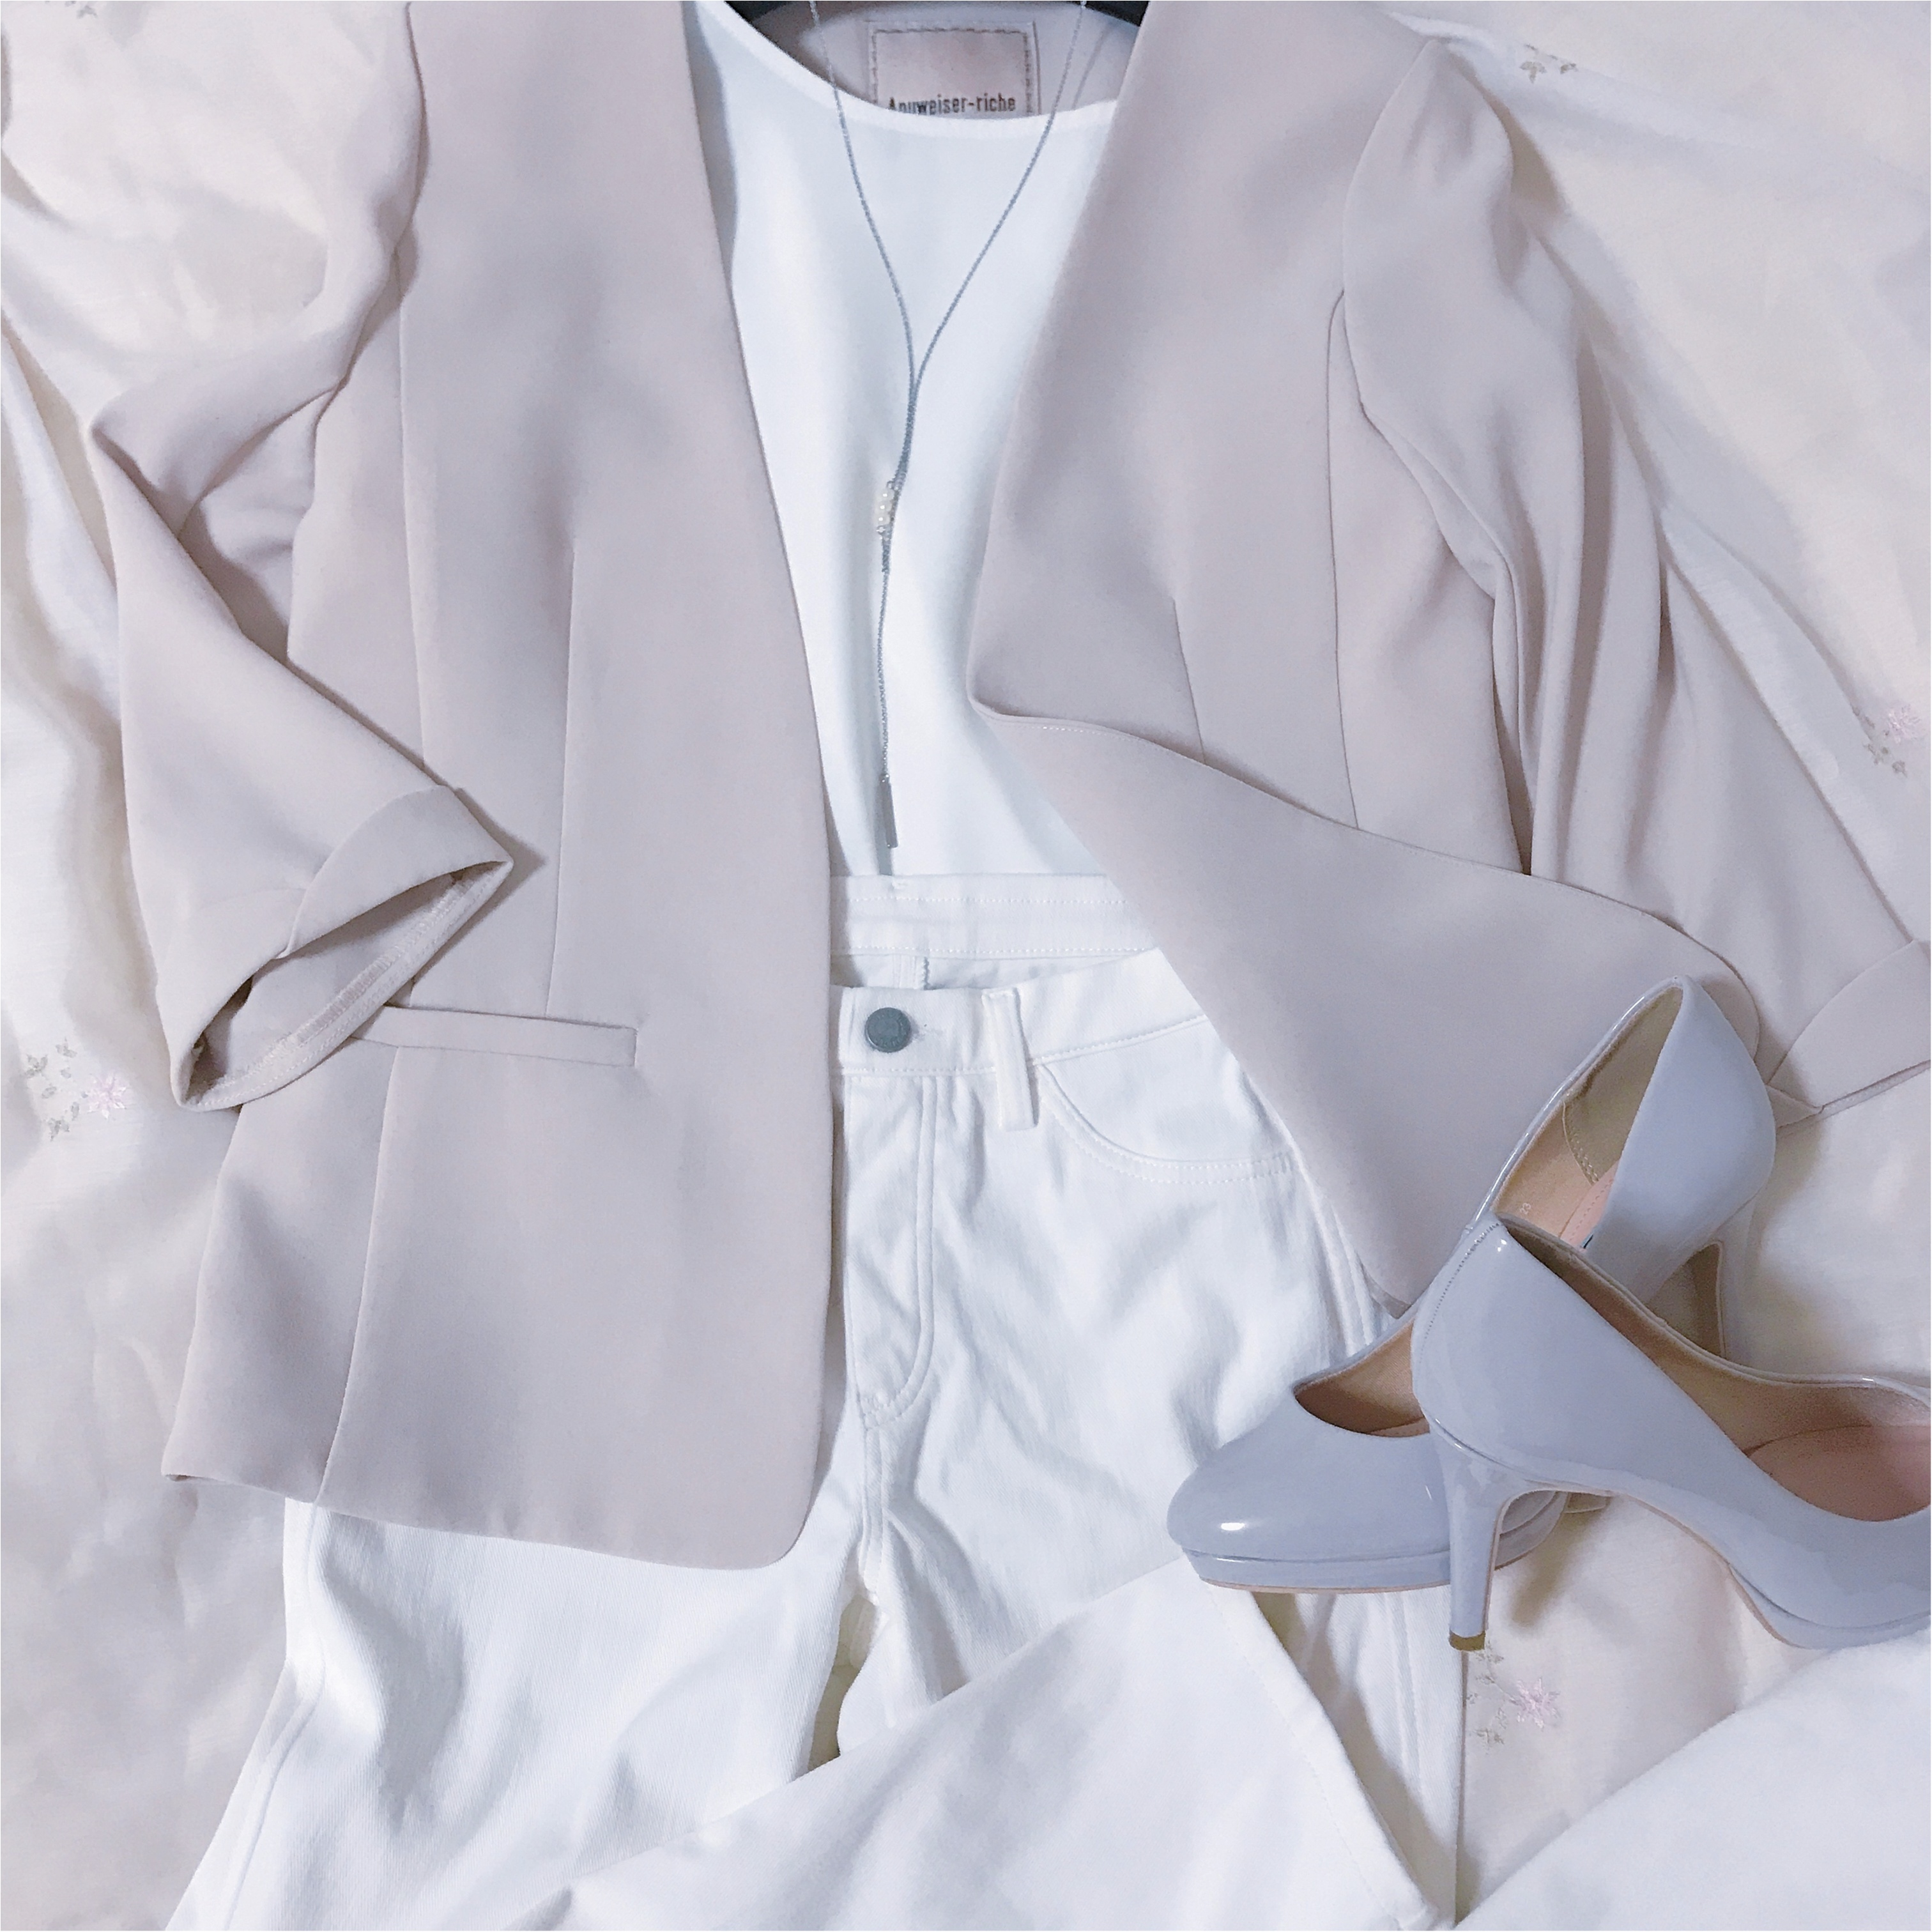 OL必須!職場コーデで必要なジャケットは3点付いてくる《apweiserriche》がオススメ♡今だけお得情報も。_6